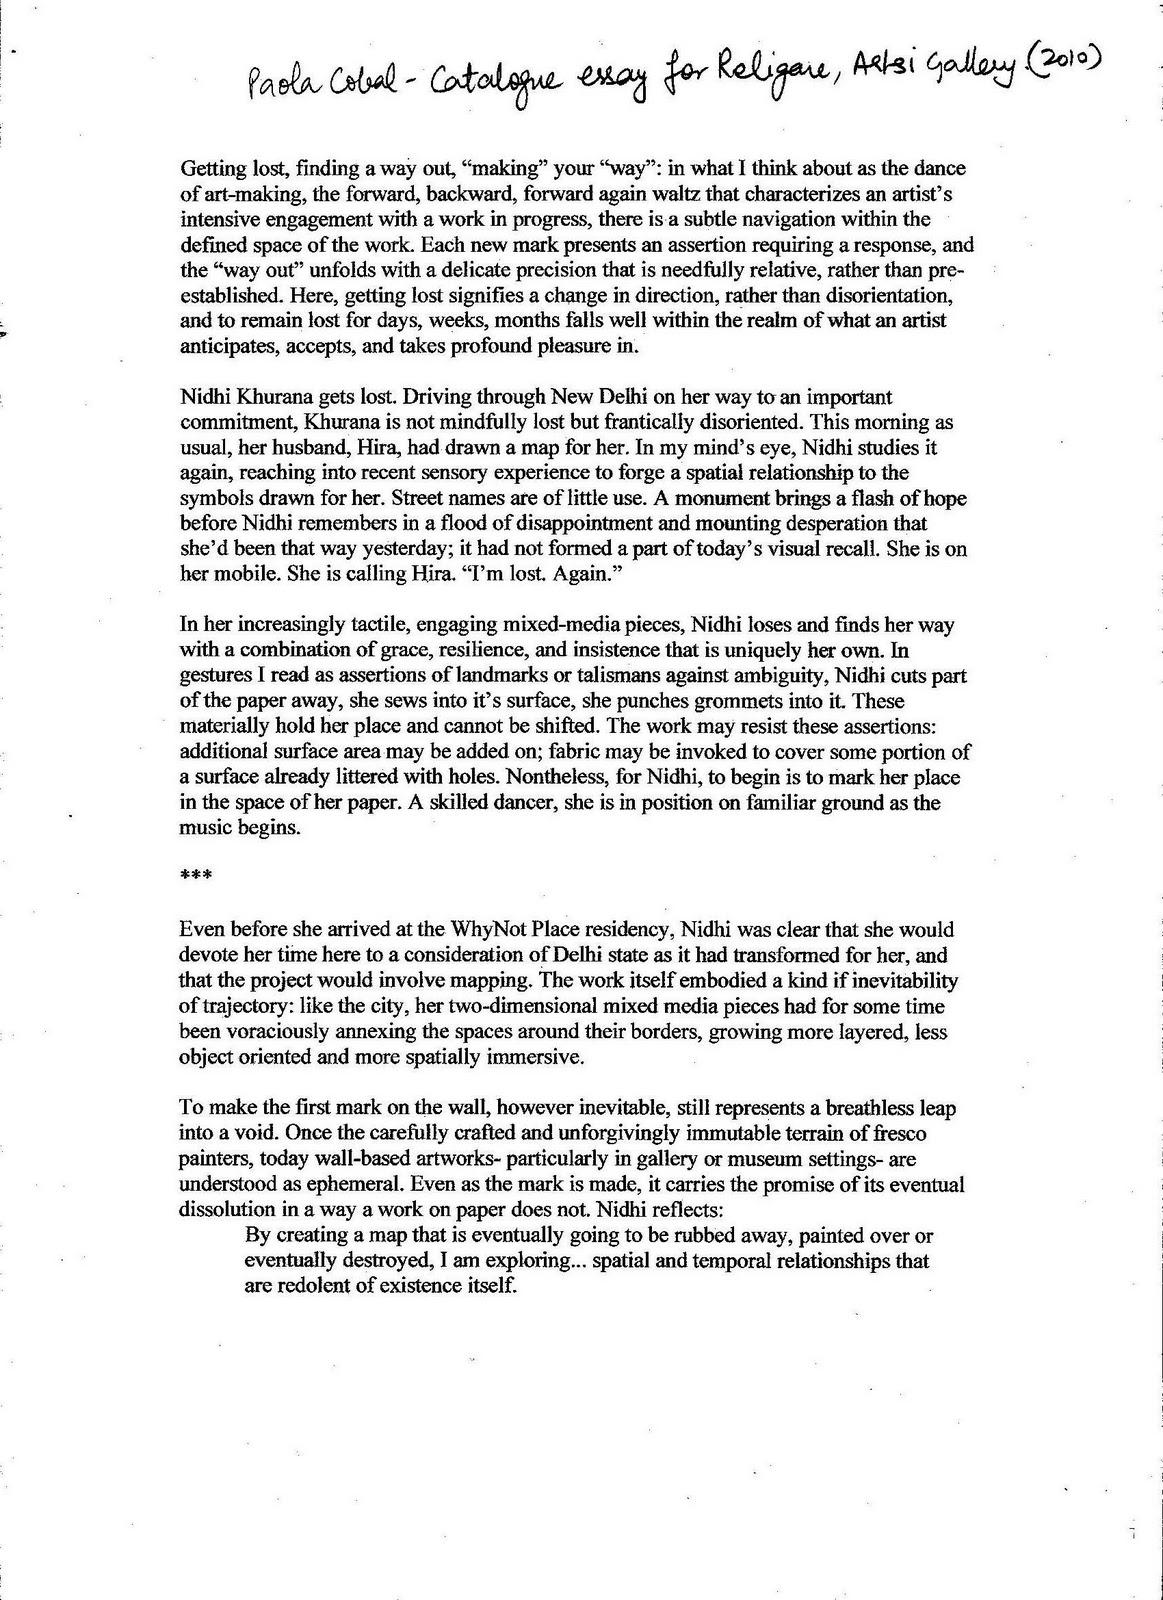 002 Essay Example Paolaessay Beautiful Heros Hero's Journey Titles Heroes Robert Cormier Questions Hero Outline Full